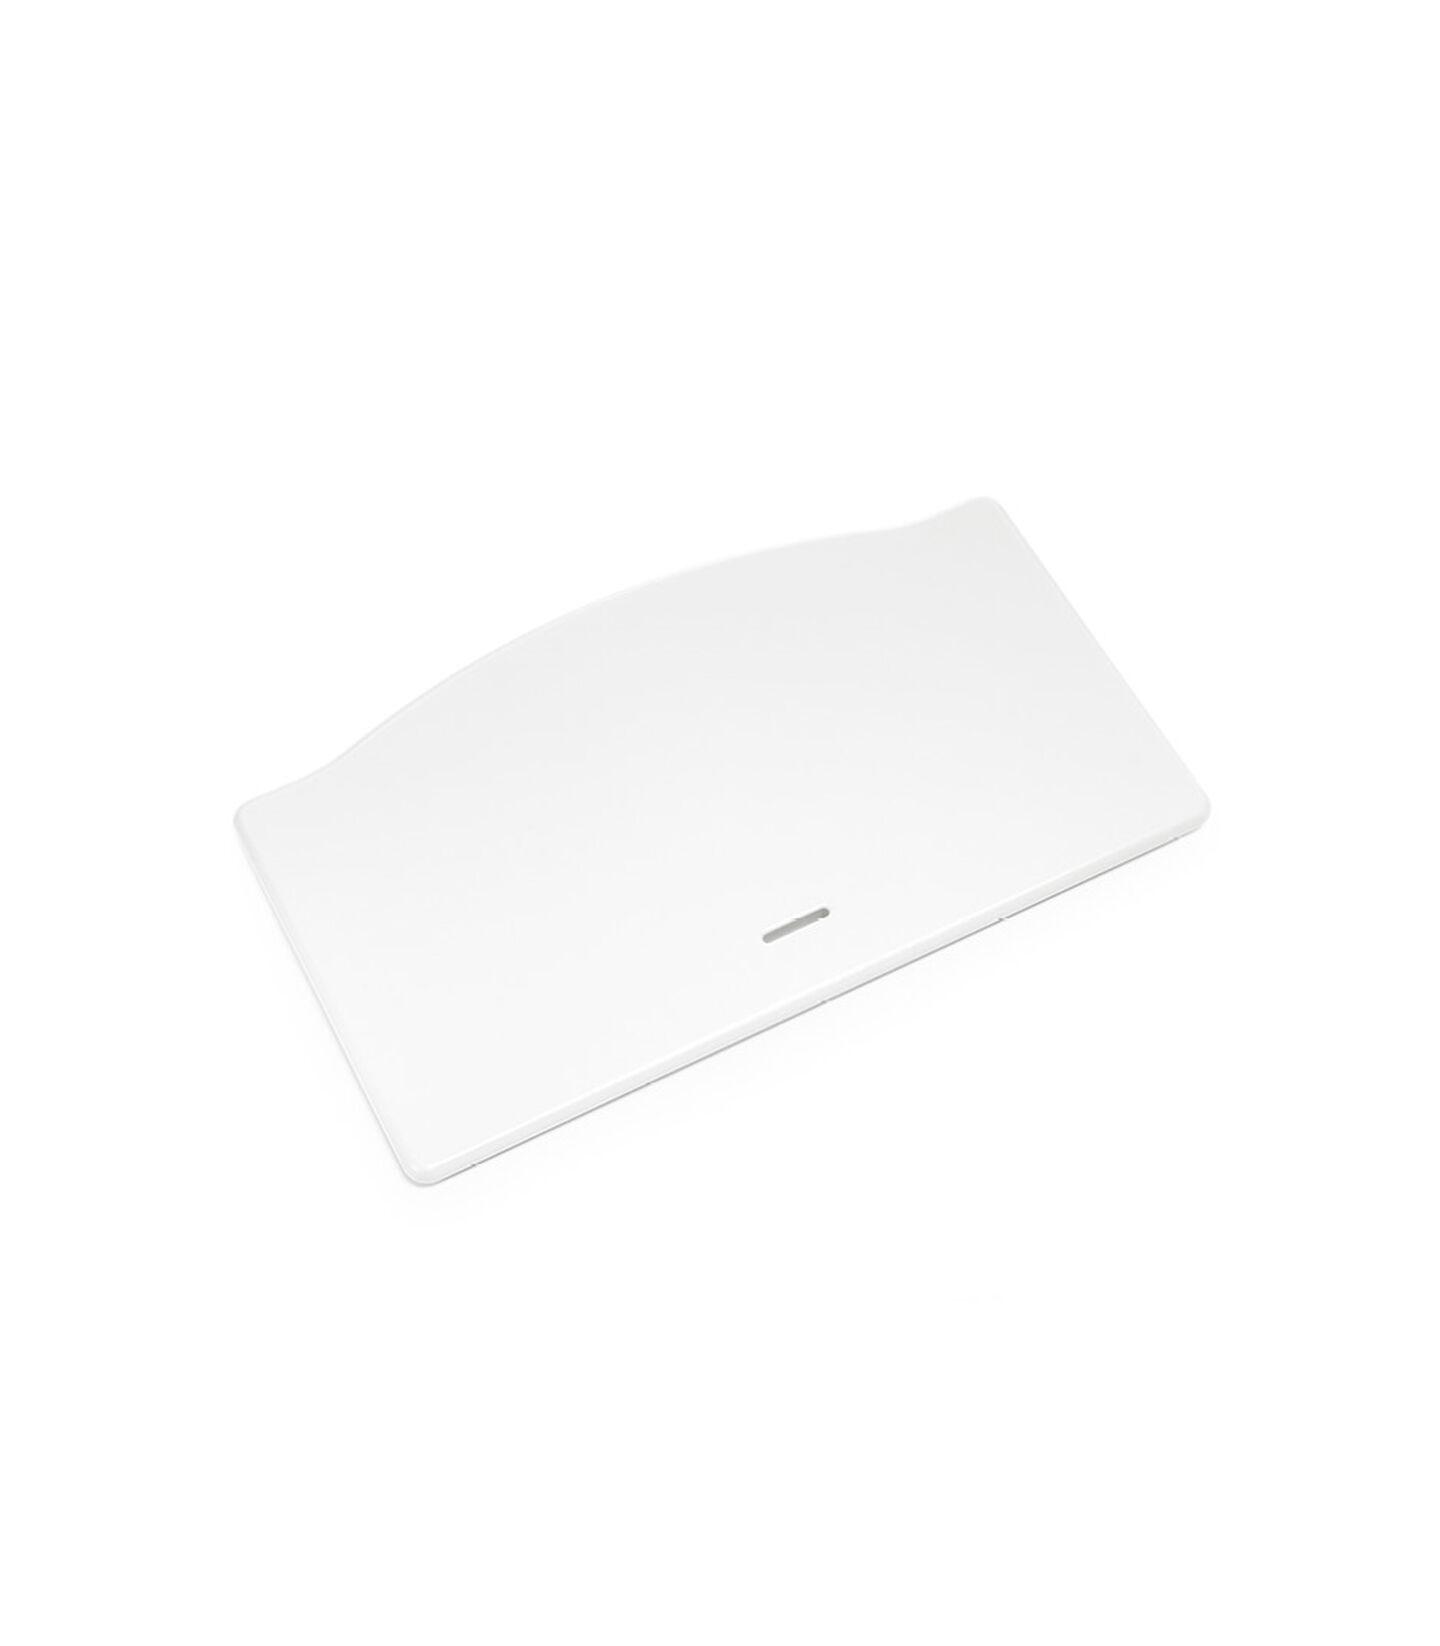 Tripp Trapp® Sitzplatte White, White, mainview view 1